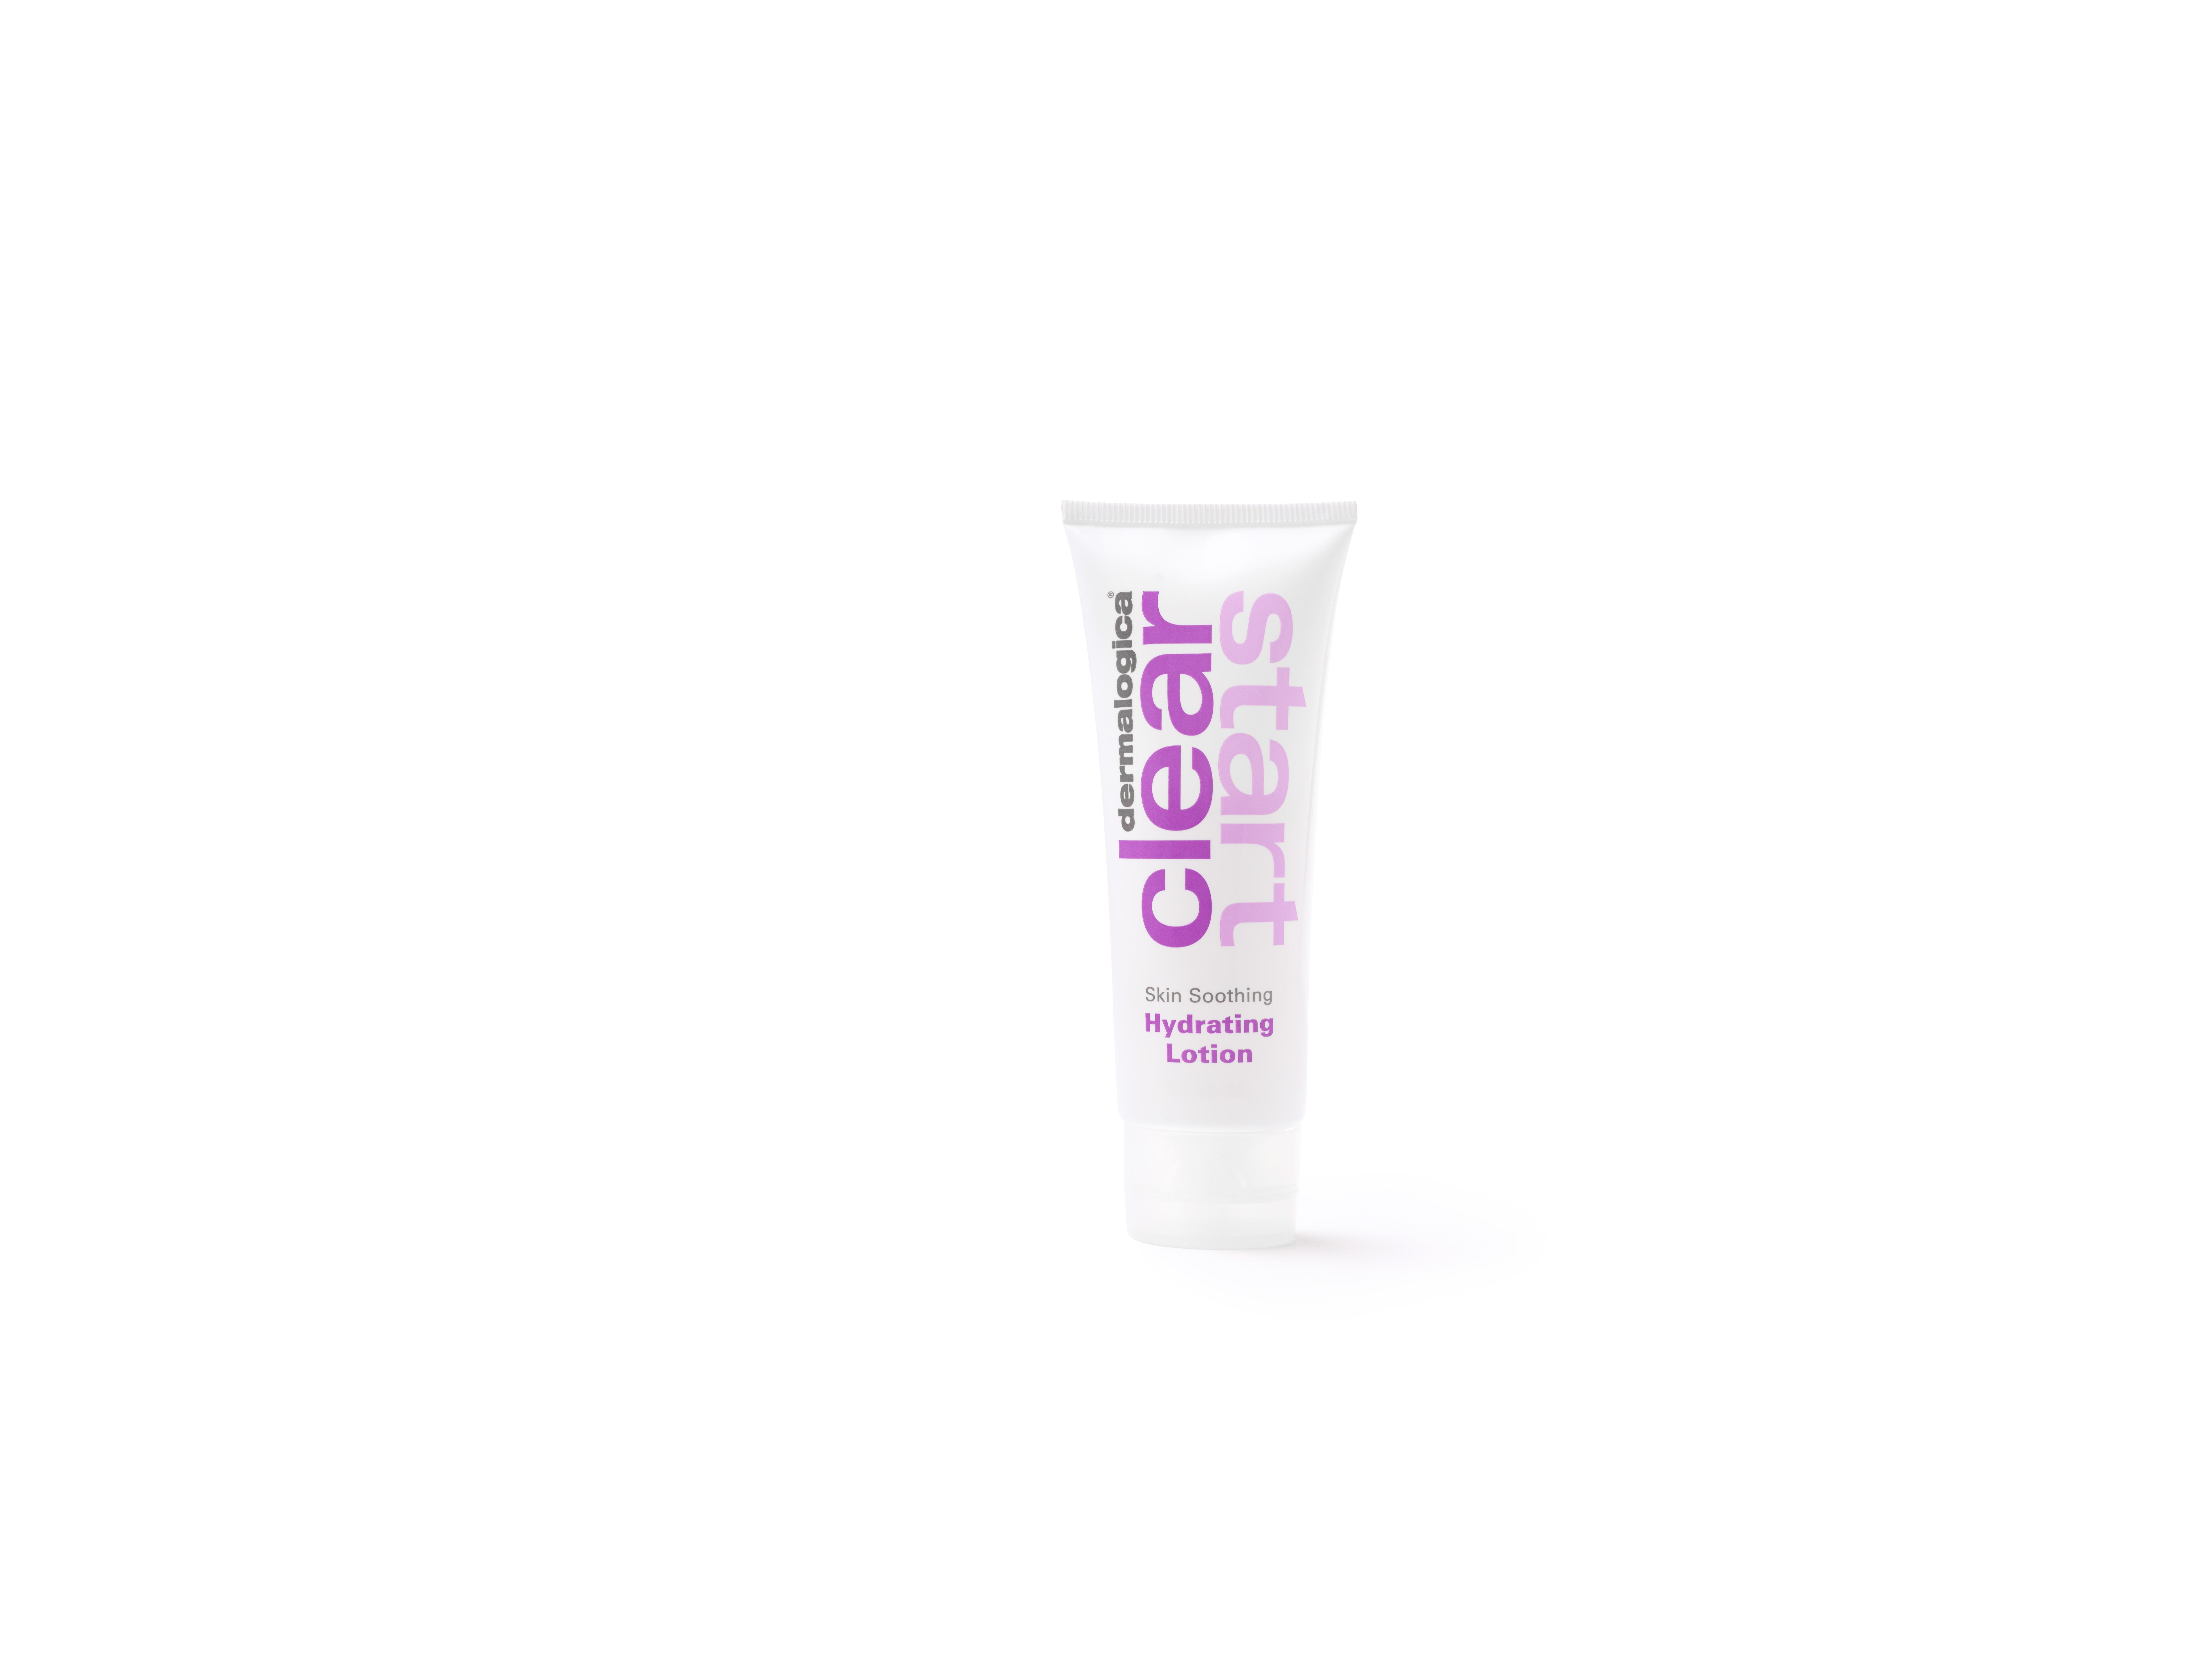 Dermalogica Skin Smoothing Hydrating Lotion, 60 ml